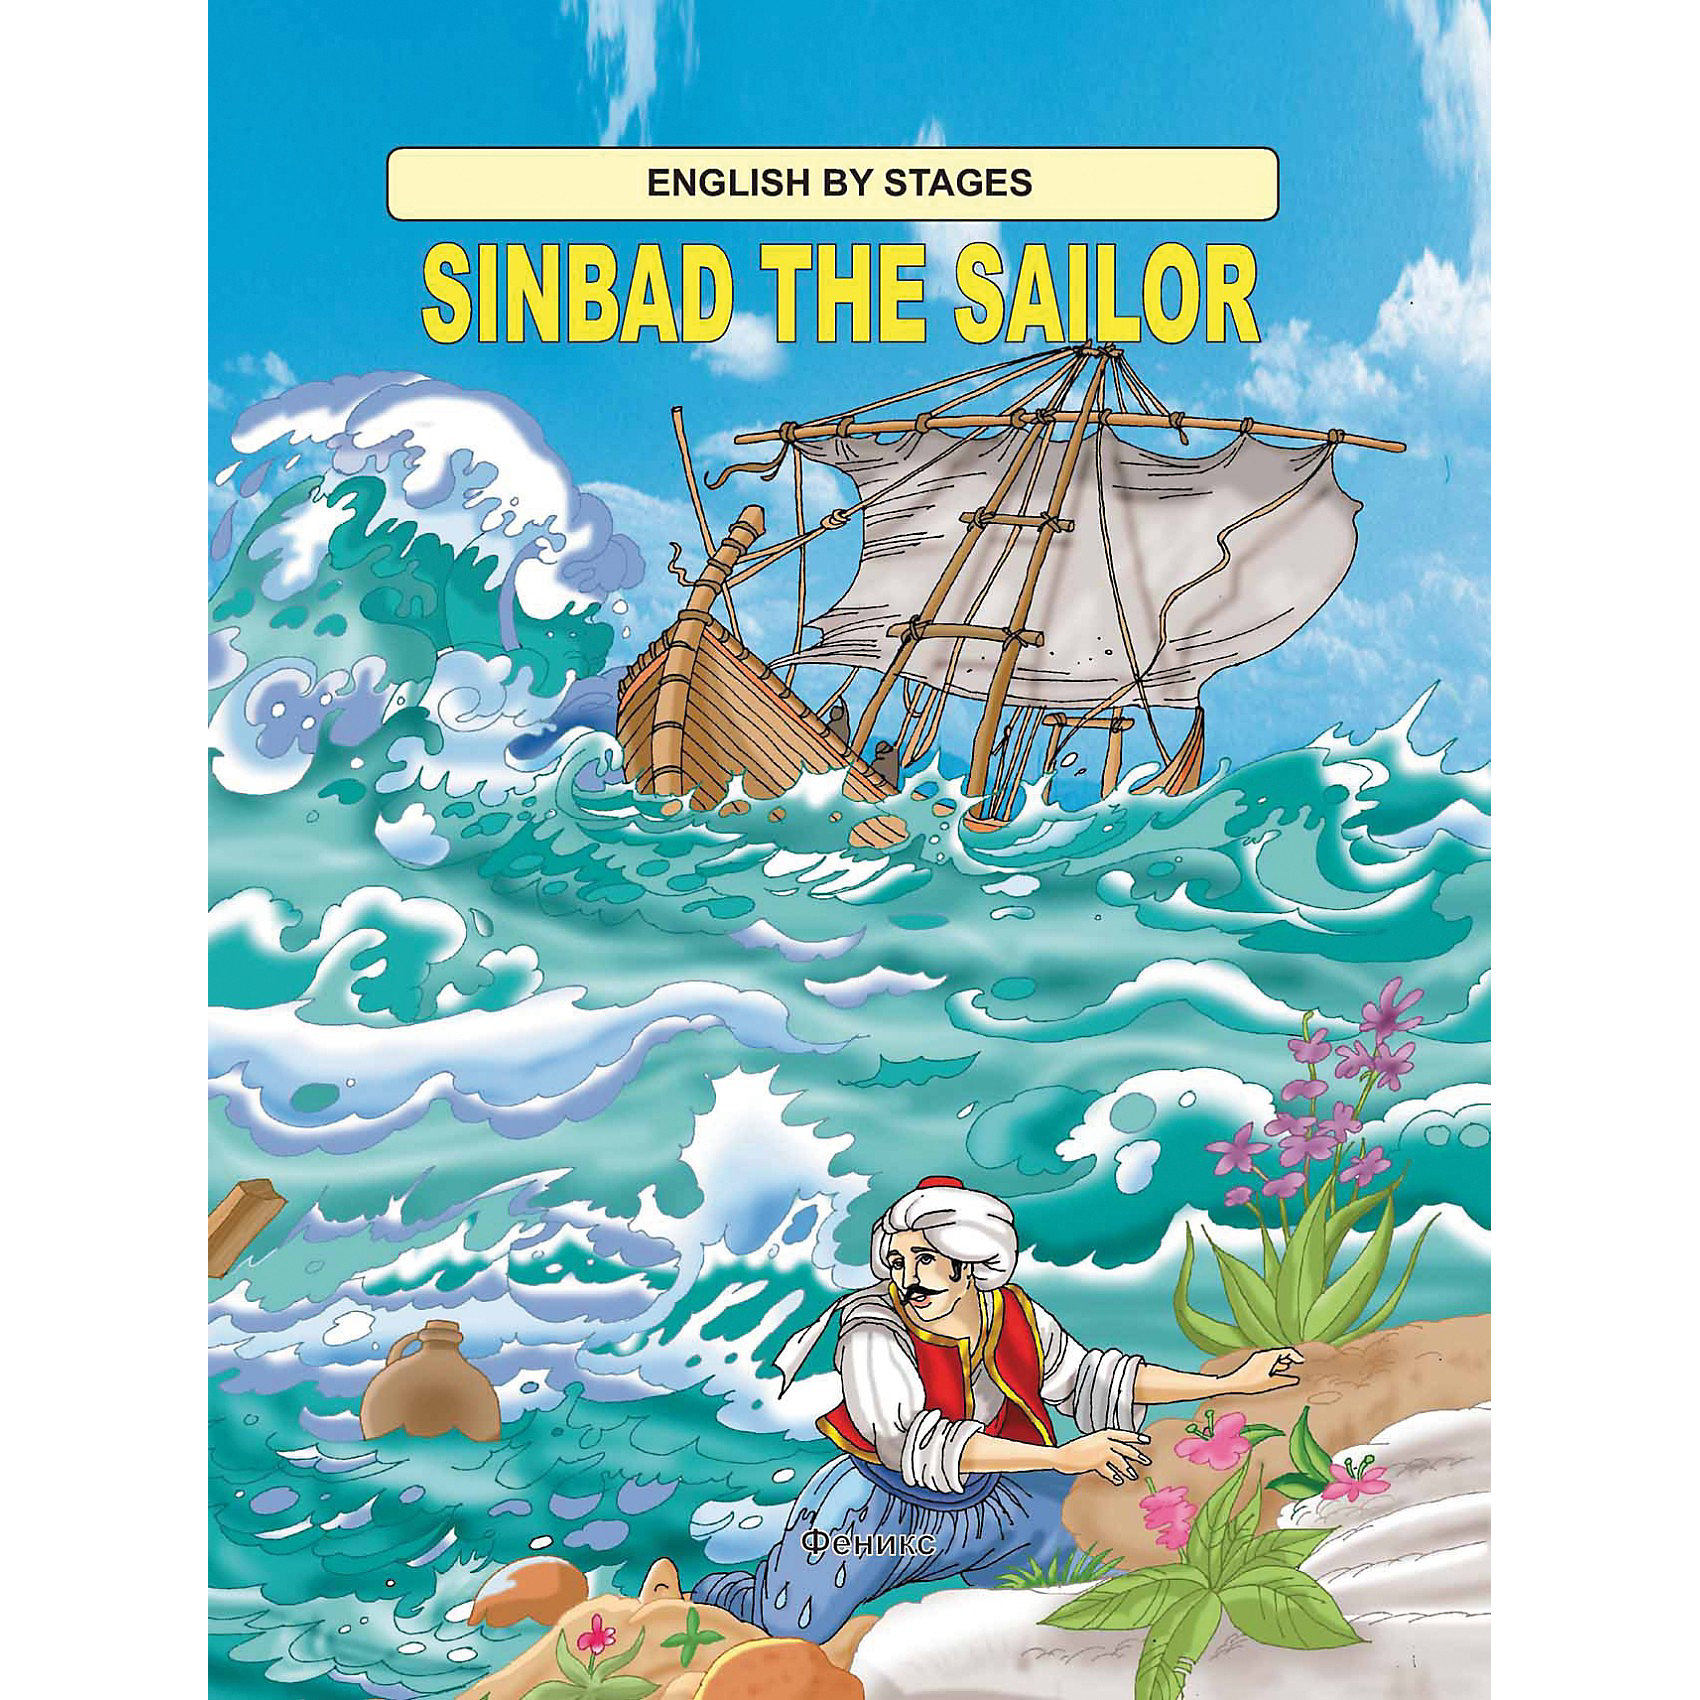 Fenix Сказка на английском Sinbad the Sailor уэллс г дж the war of the worlds война миров книга для чтения на английском языке